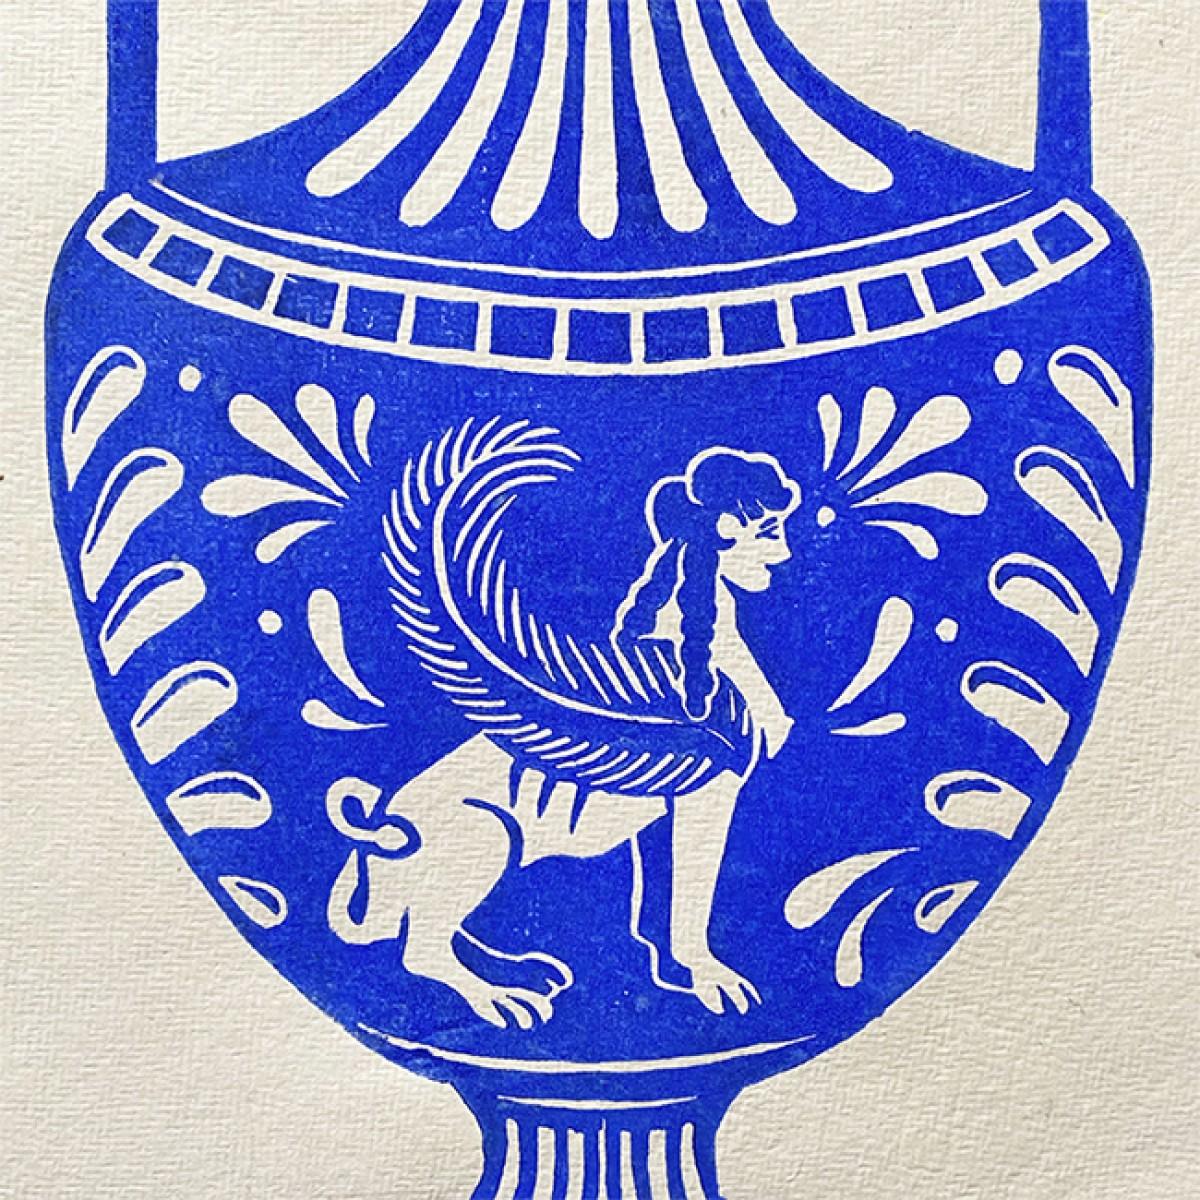 Juliana Fischer - Amphore Sphinx - Linoldruck, blau, DIN A3